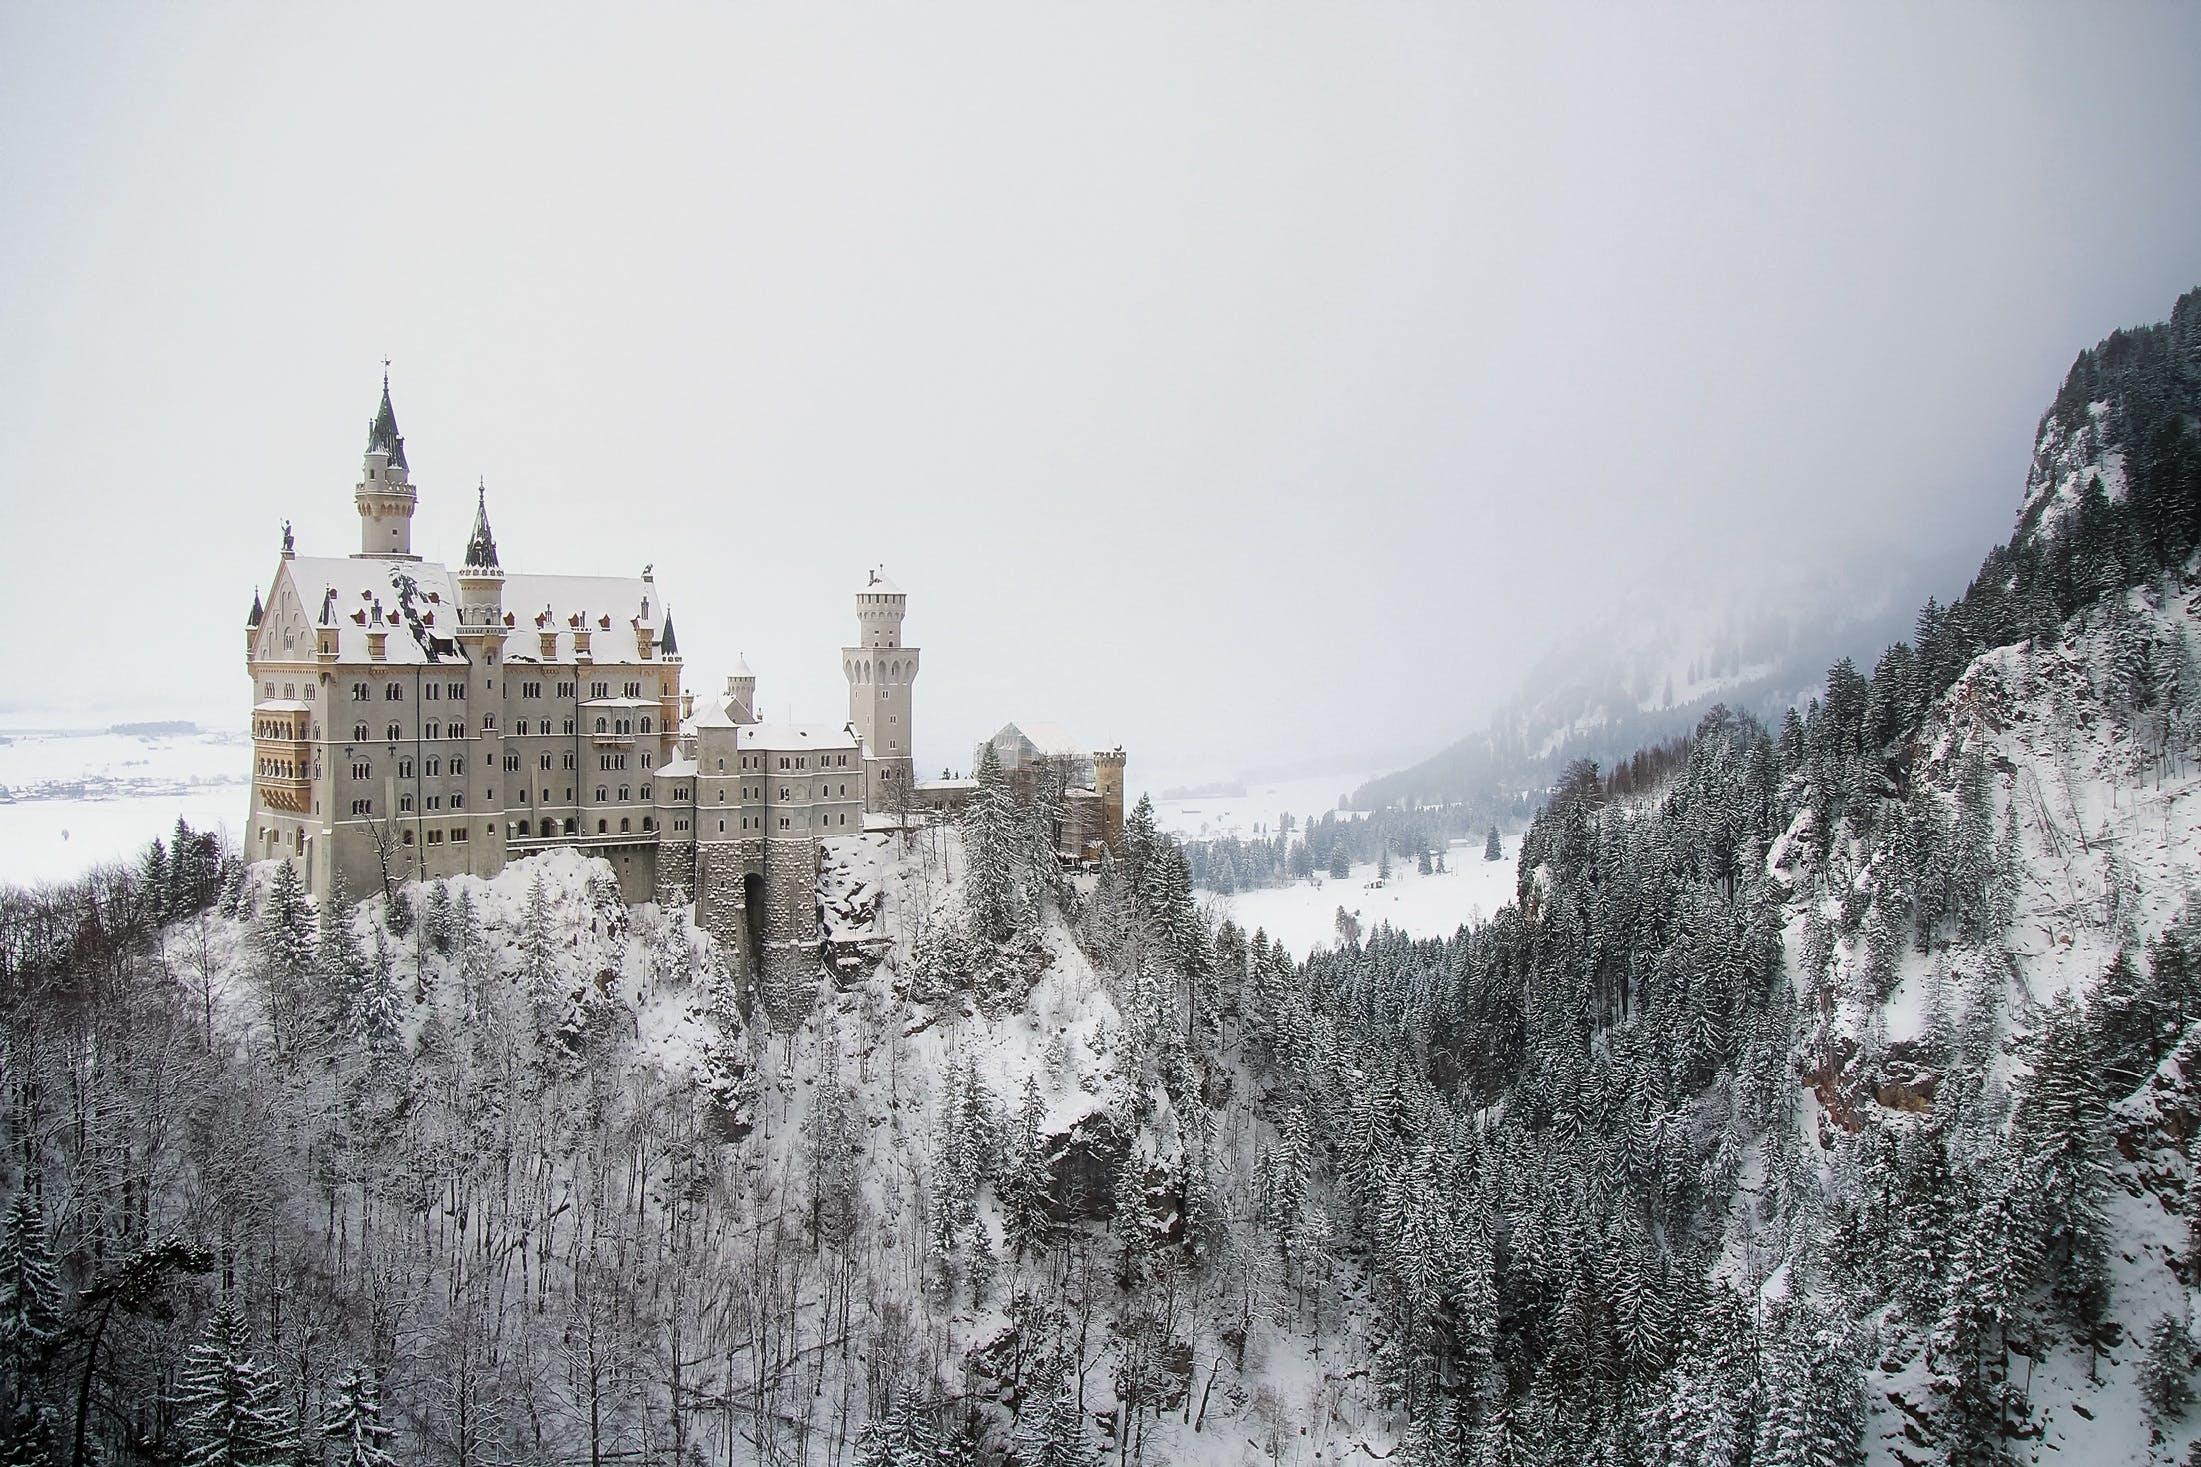 Castle on Cliff